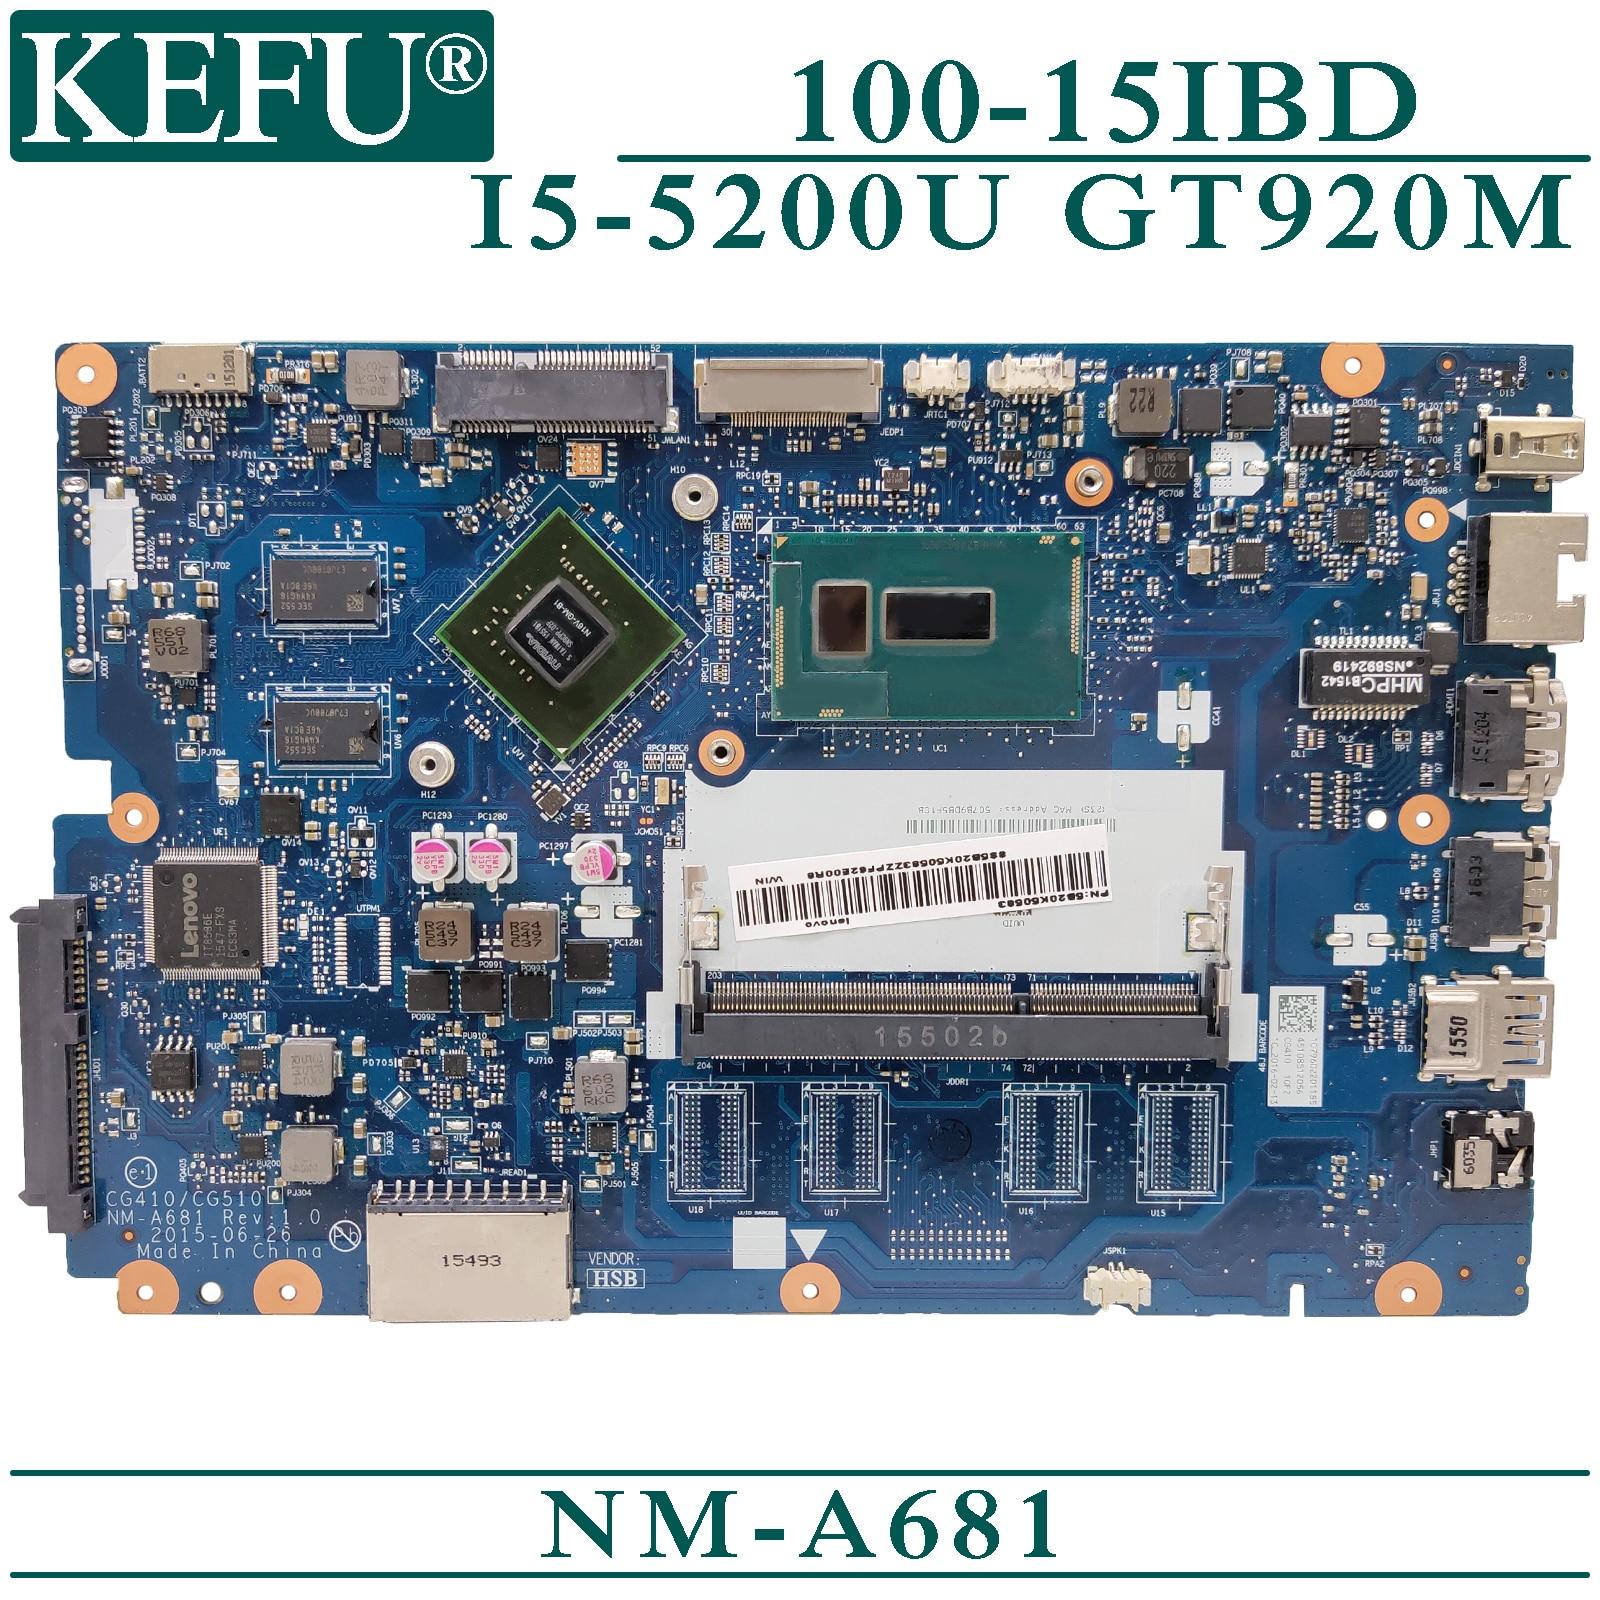 KEFU NM-A681 اللوحة الرئيسية الأصلية لينوفو TianYi 100-15IBD مع I5-5200U اللوحة الأم GT920M المحمول